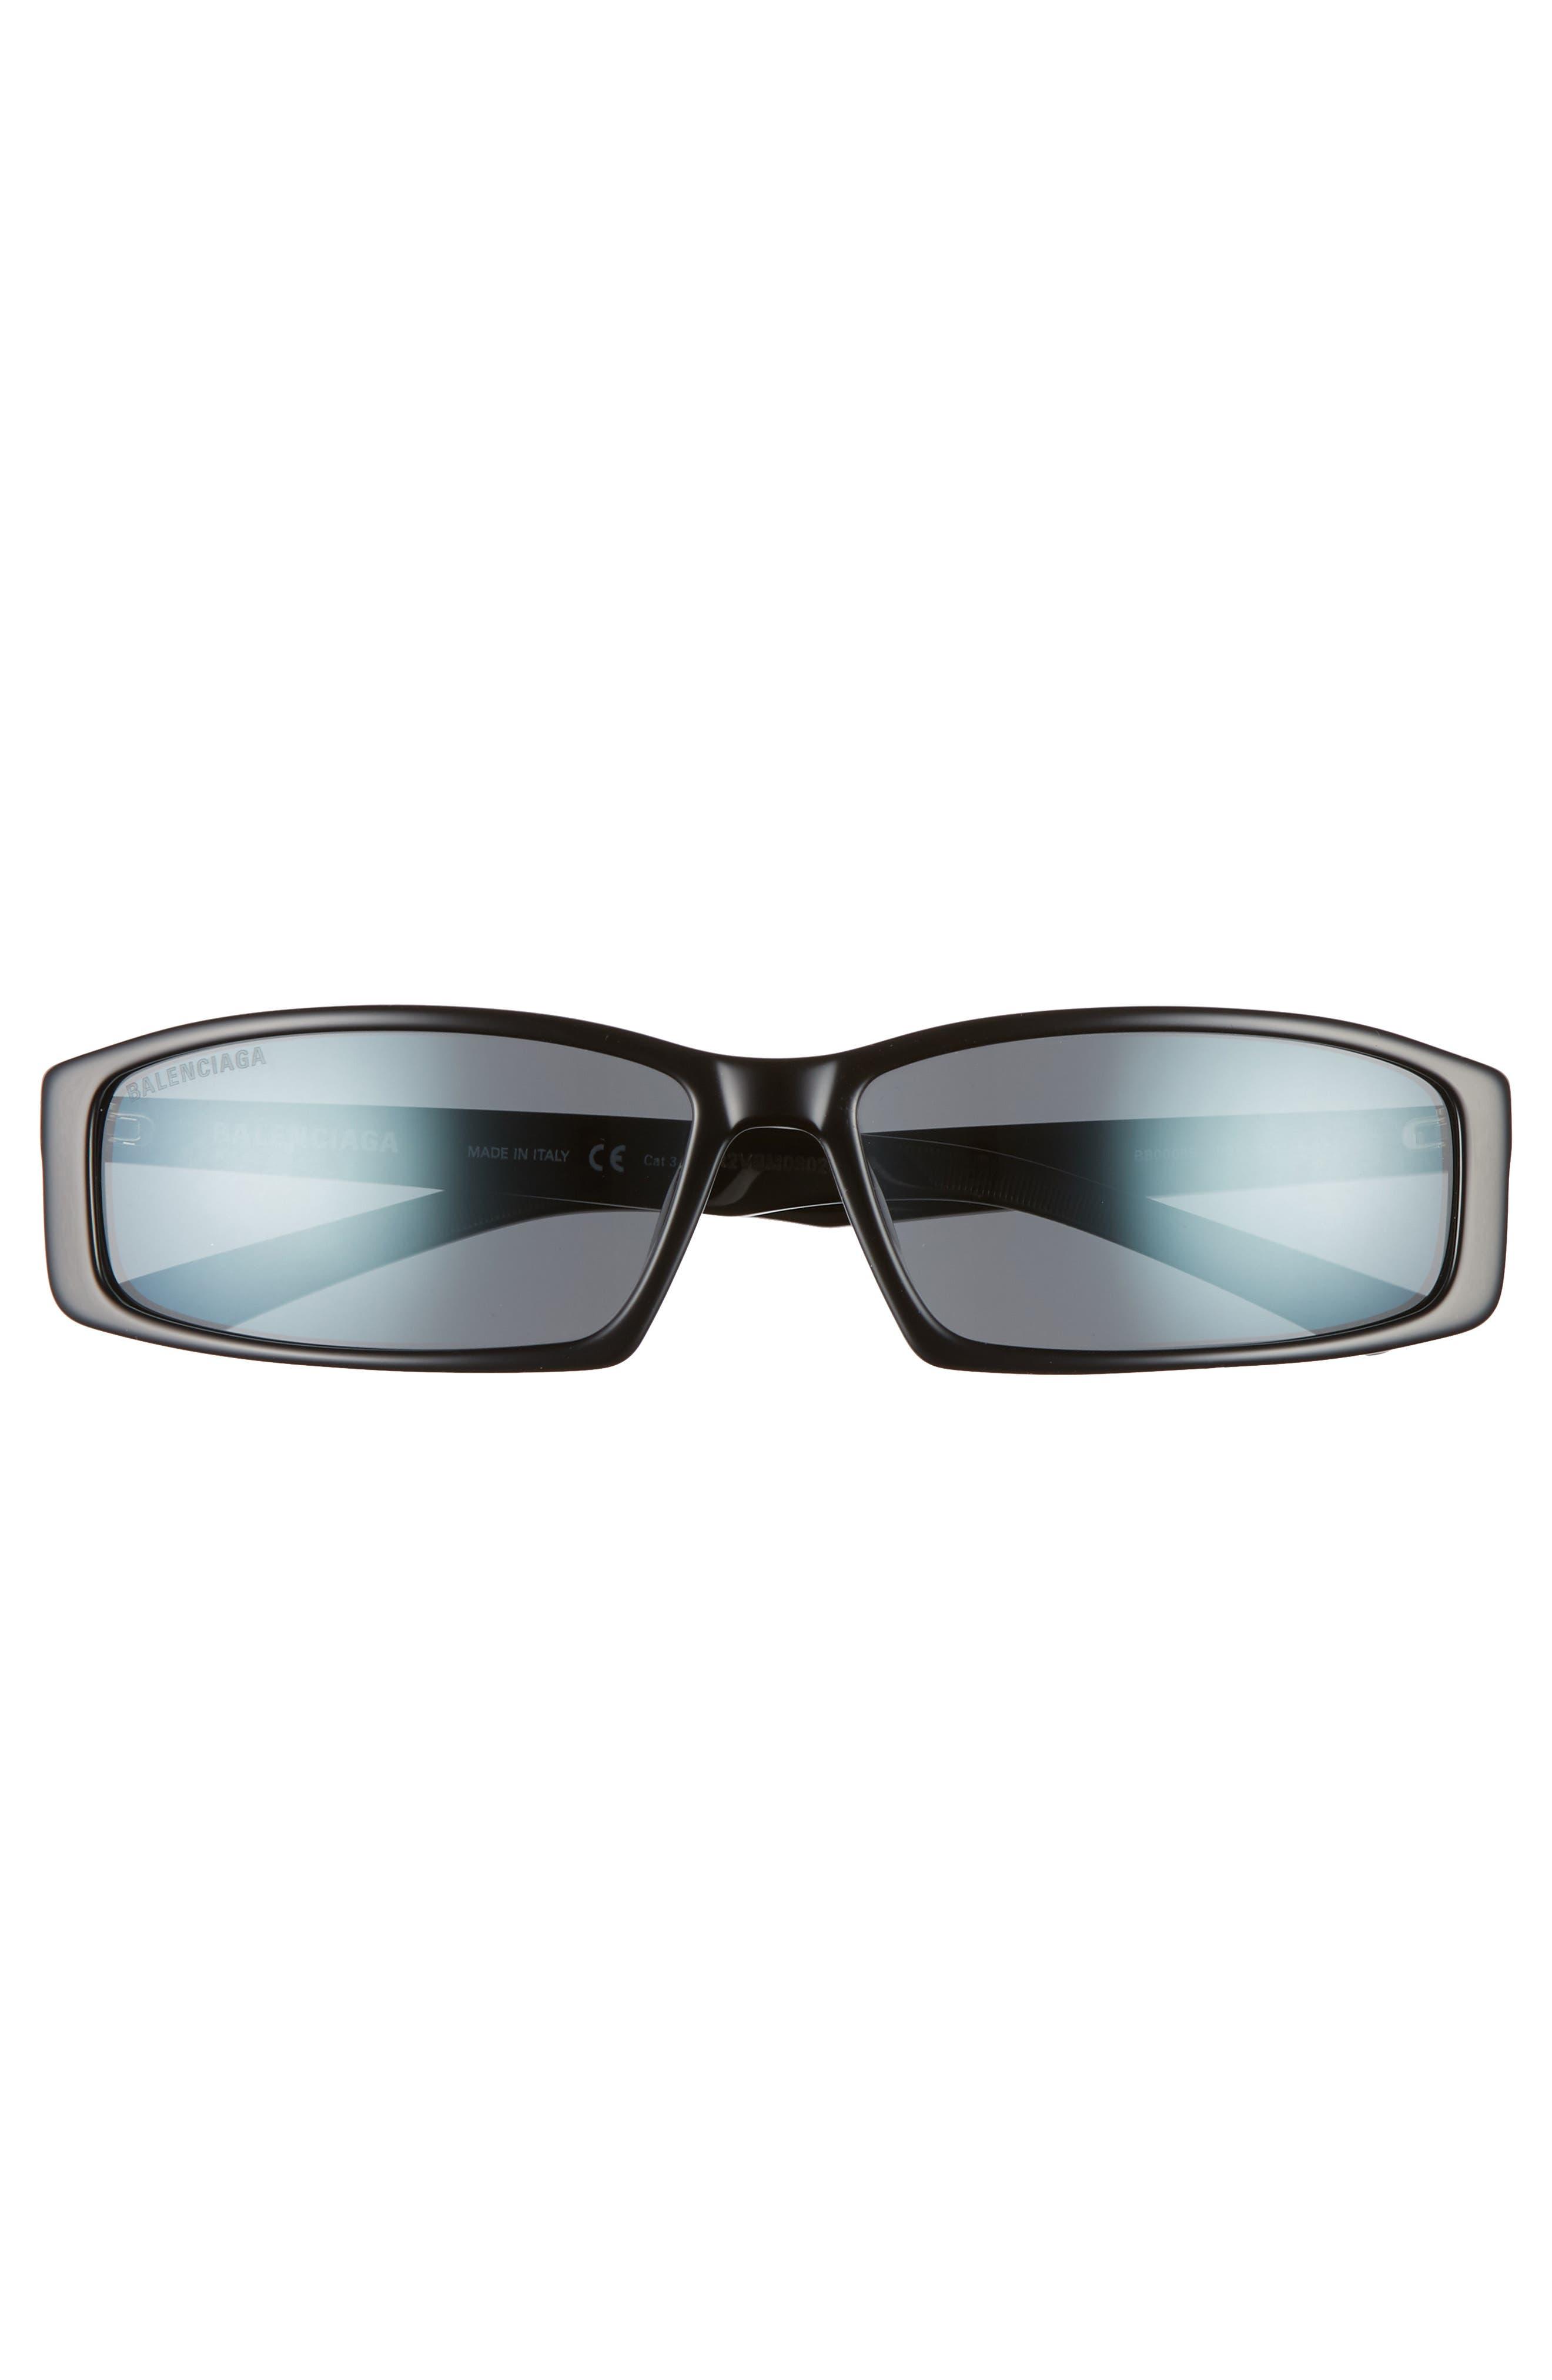 BALENCIAGA, 60mm Rectangle Sunglasses, Alternate thumbnail 3, color, SHINY BLACK/ GREY